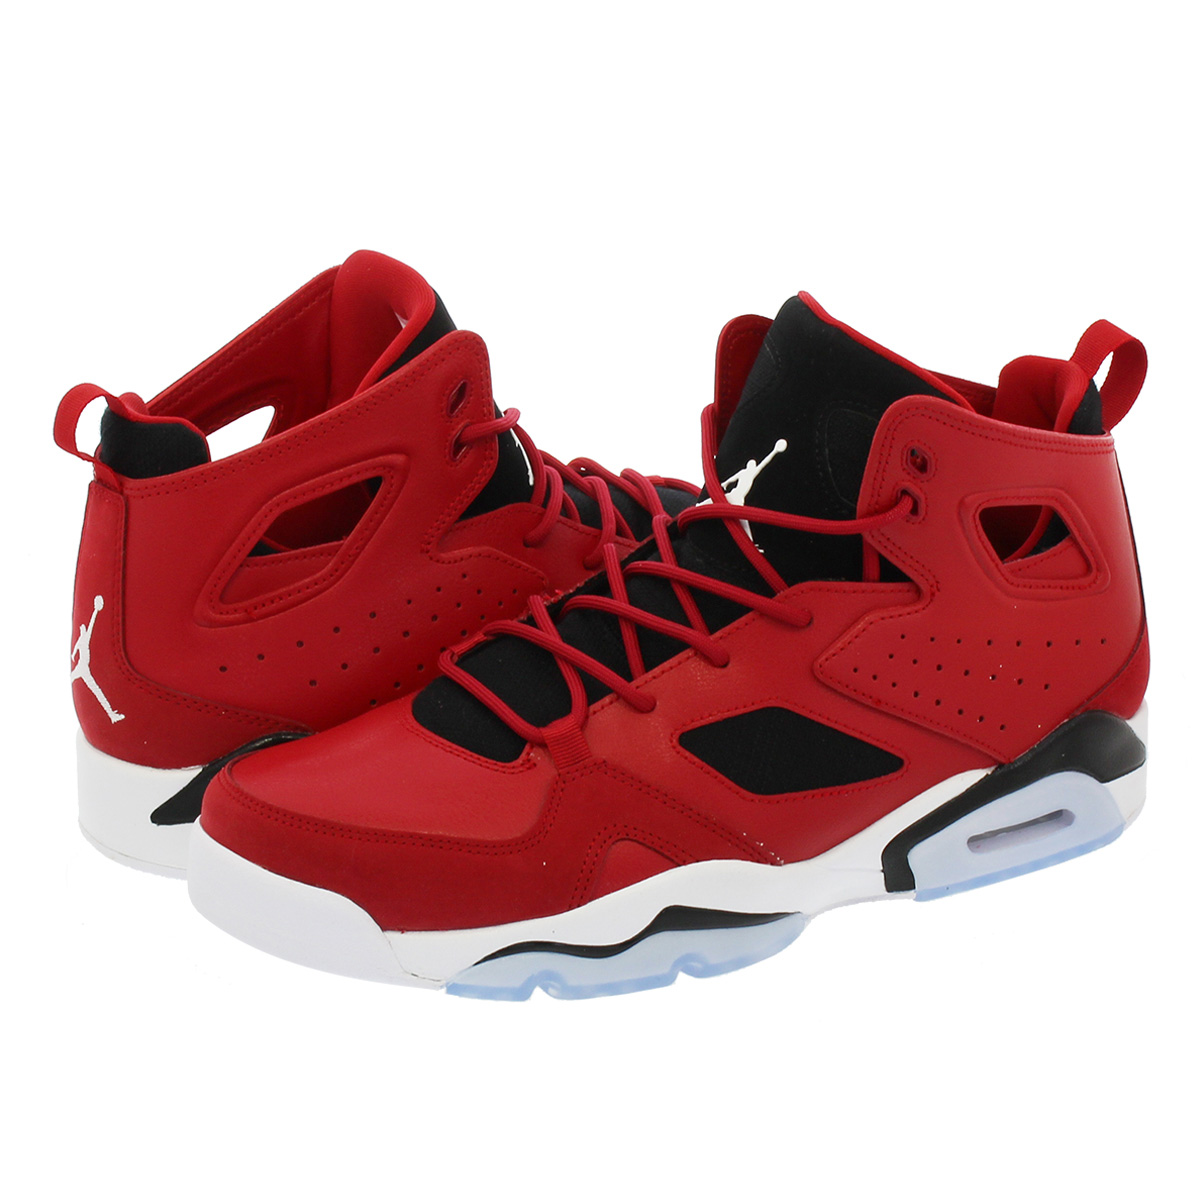 12435ef51825 NIKE JORDAN FLIGHT CLUB 91 Nike Jordan flight club 91 GYM RED BLACK WHITE